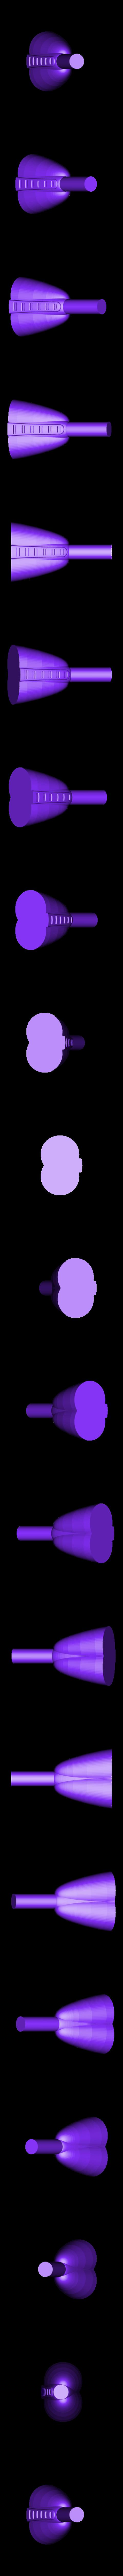 psychogun c.stl Download free STL file COBRA (PSYCHOGUN) • 3D printer object, DJER